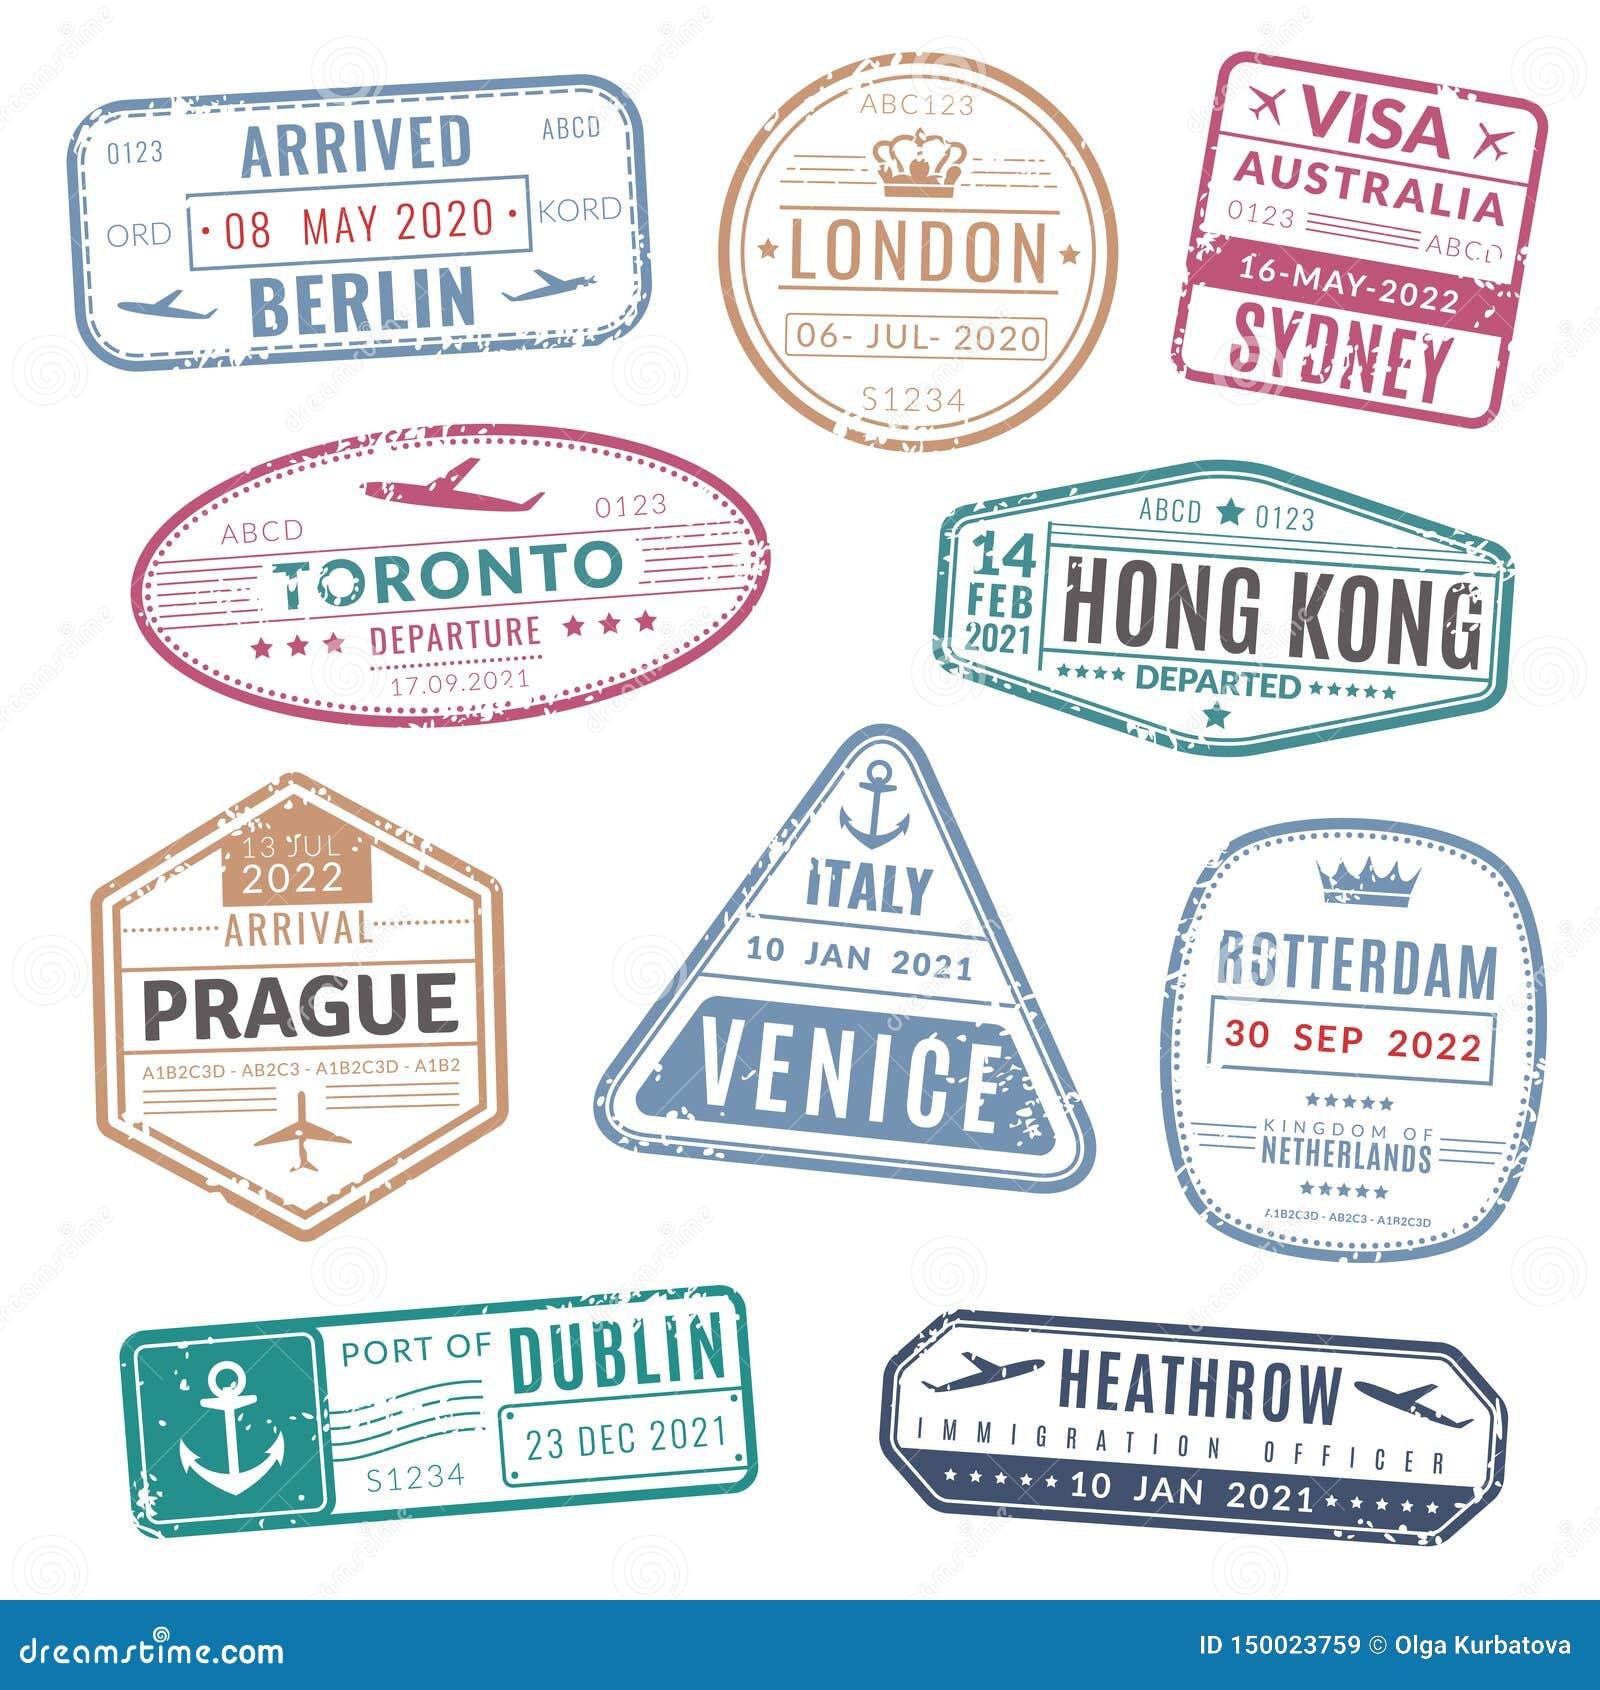 Travel Stamp Vintage Passport Visa International Arrived Stamps With Grunge Texture Isolated Vector Set Stock Vector Illustration Of Label Passport 150023759